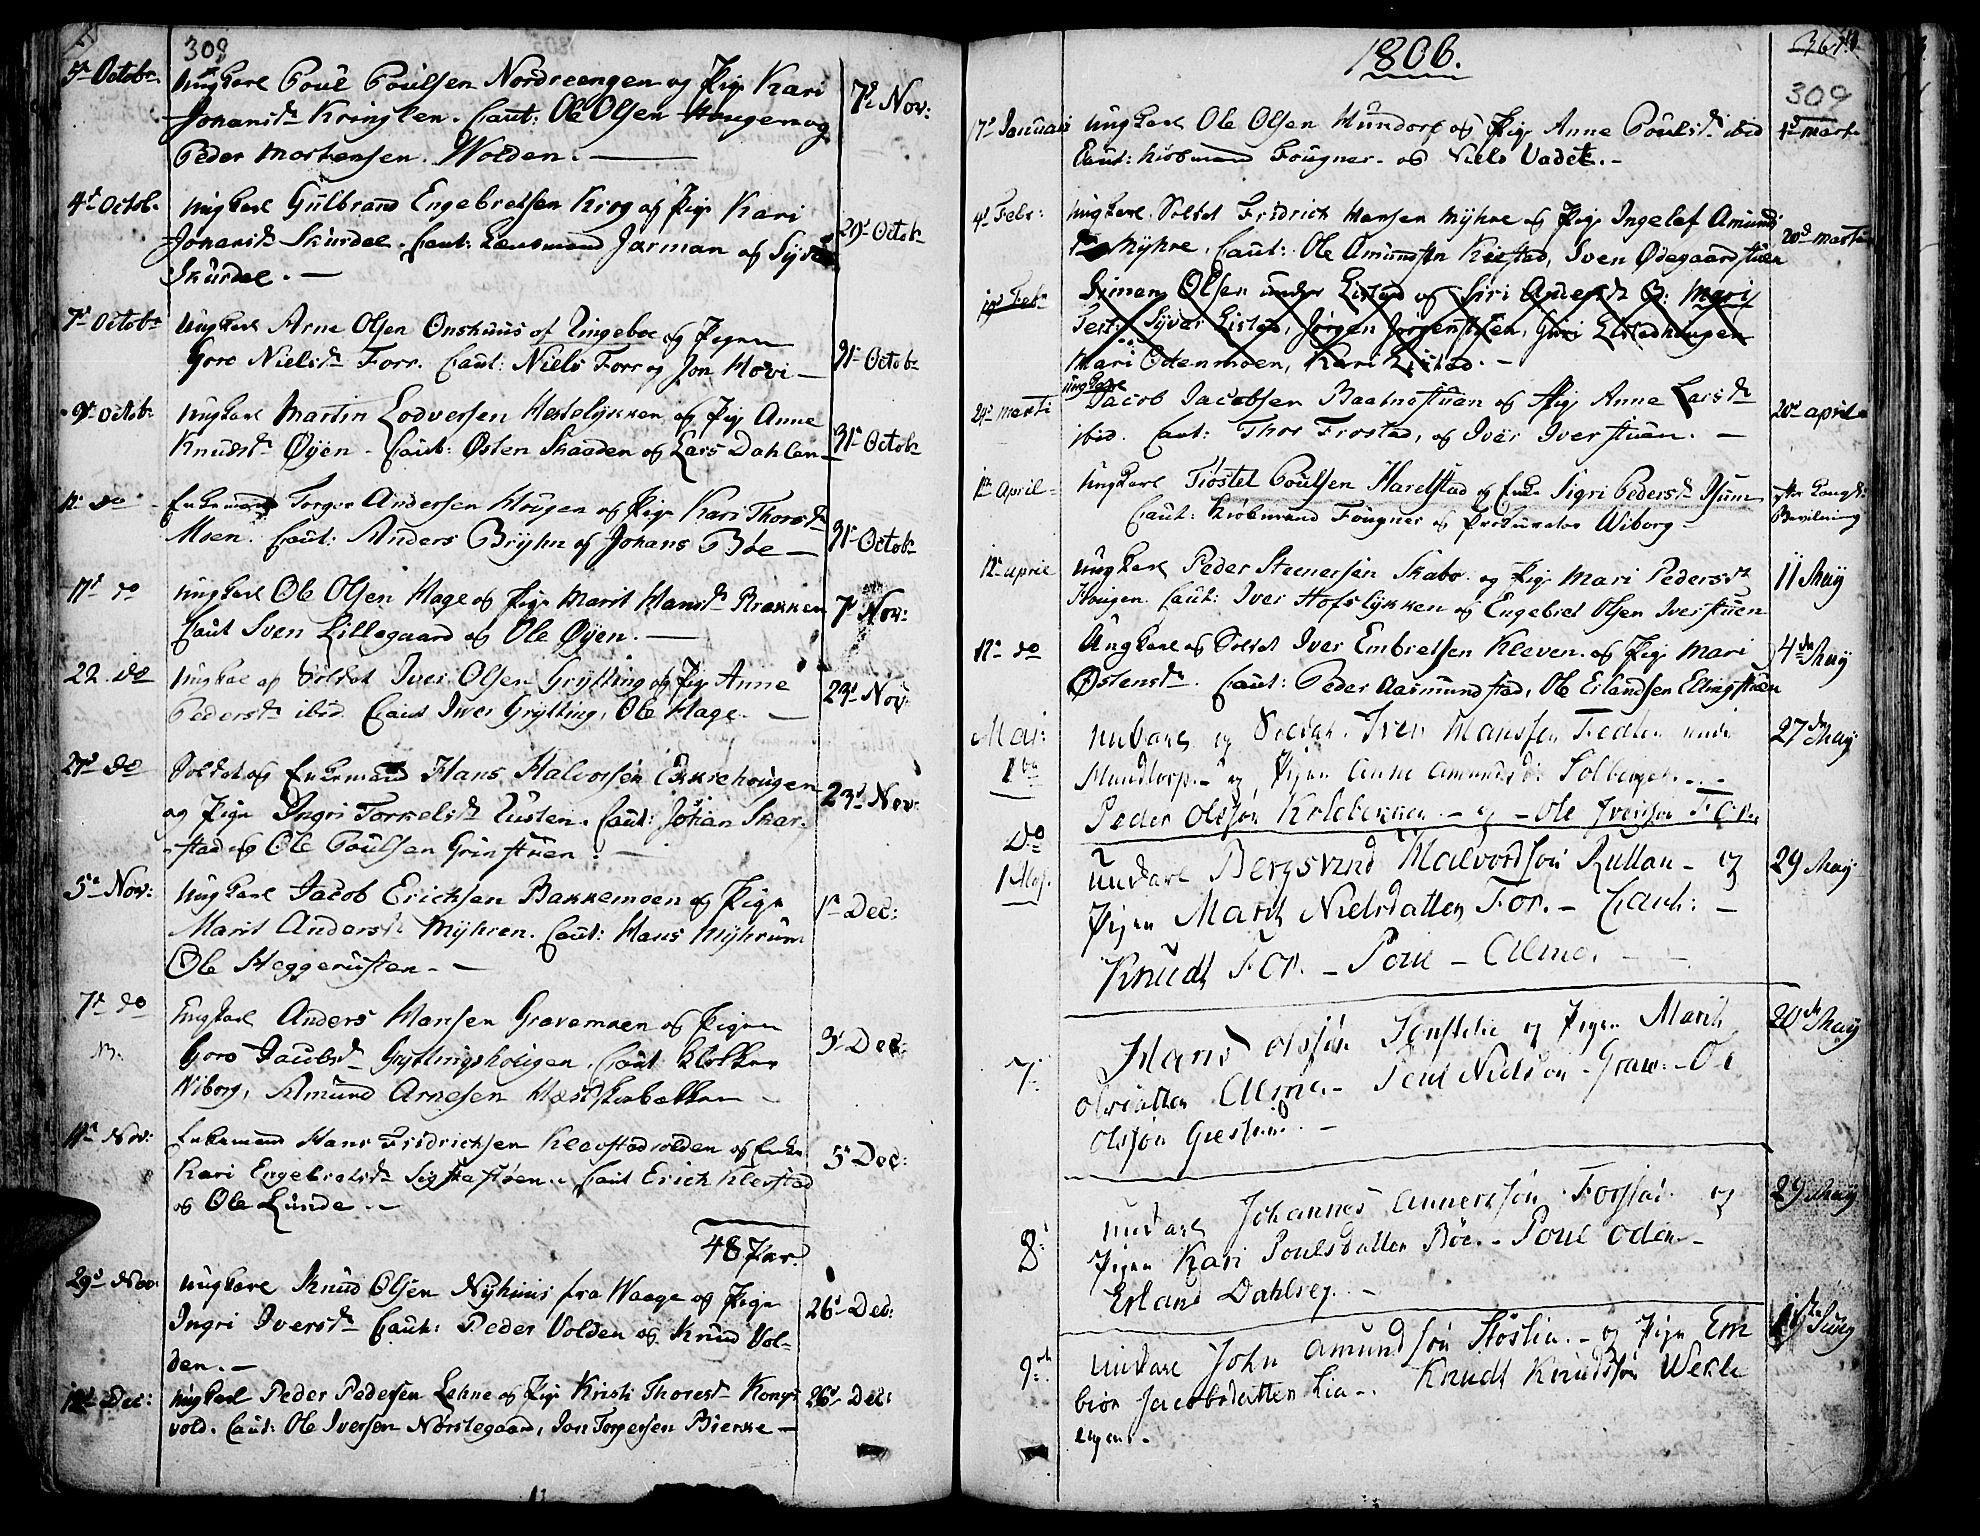 SAH, Fron prestekontor, H/Ha/Haa/L0001: Ministerialbok nr. 1, 1799-1816, s. 308-309